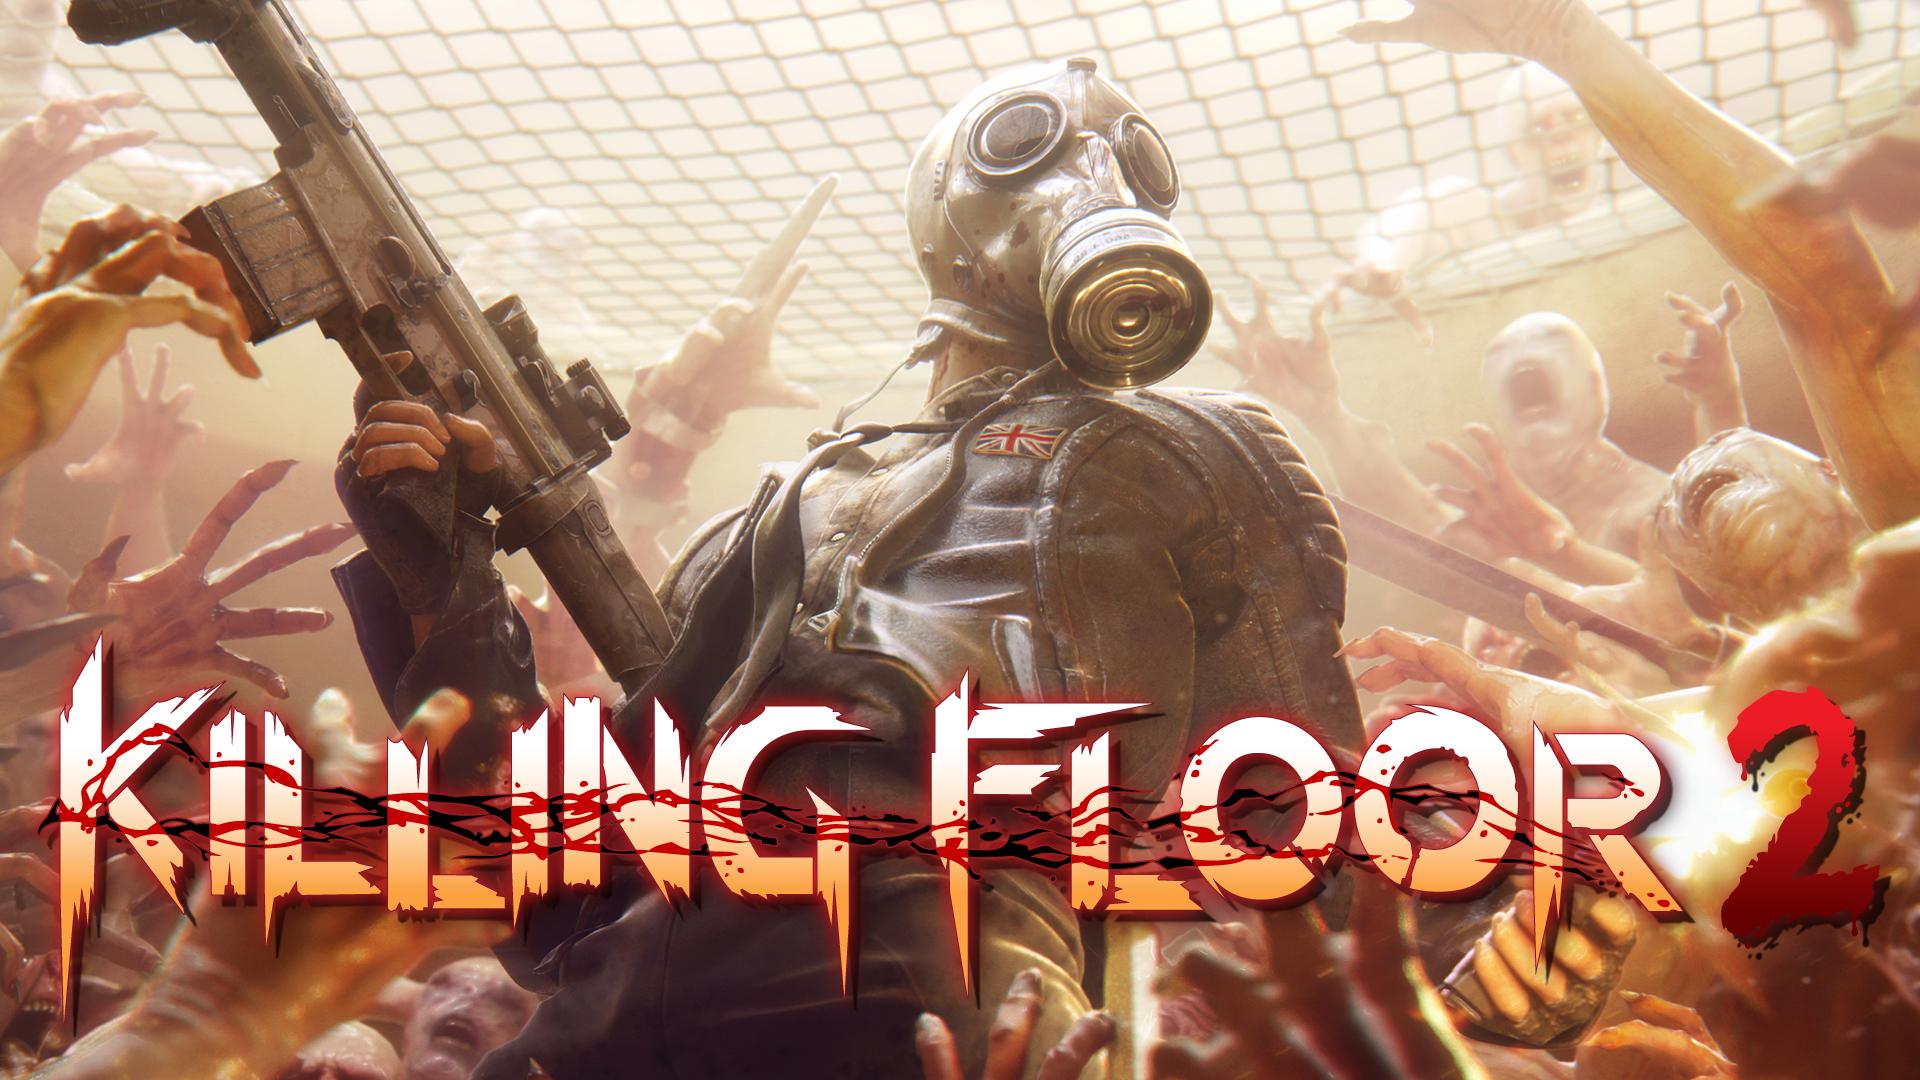 killing-floor-2-art-1920x1080-with-logo